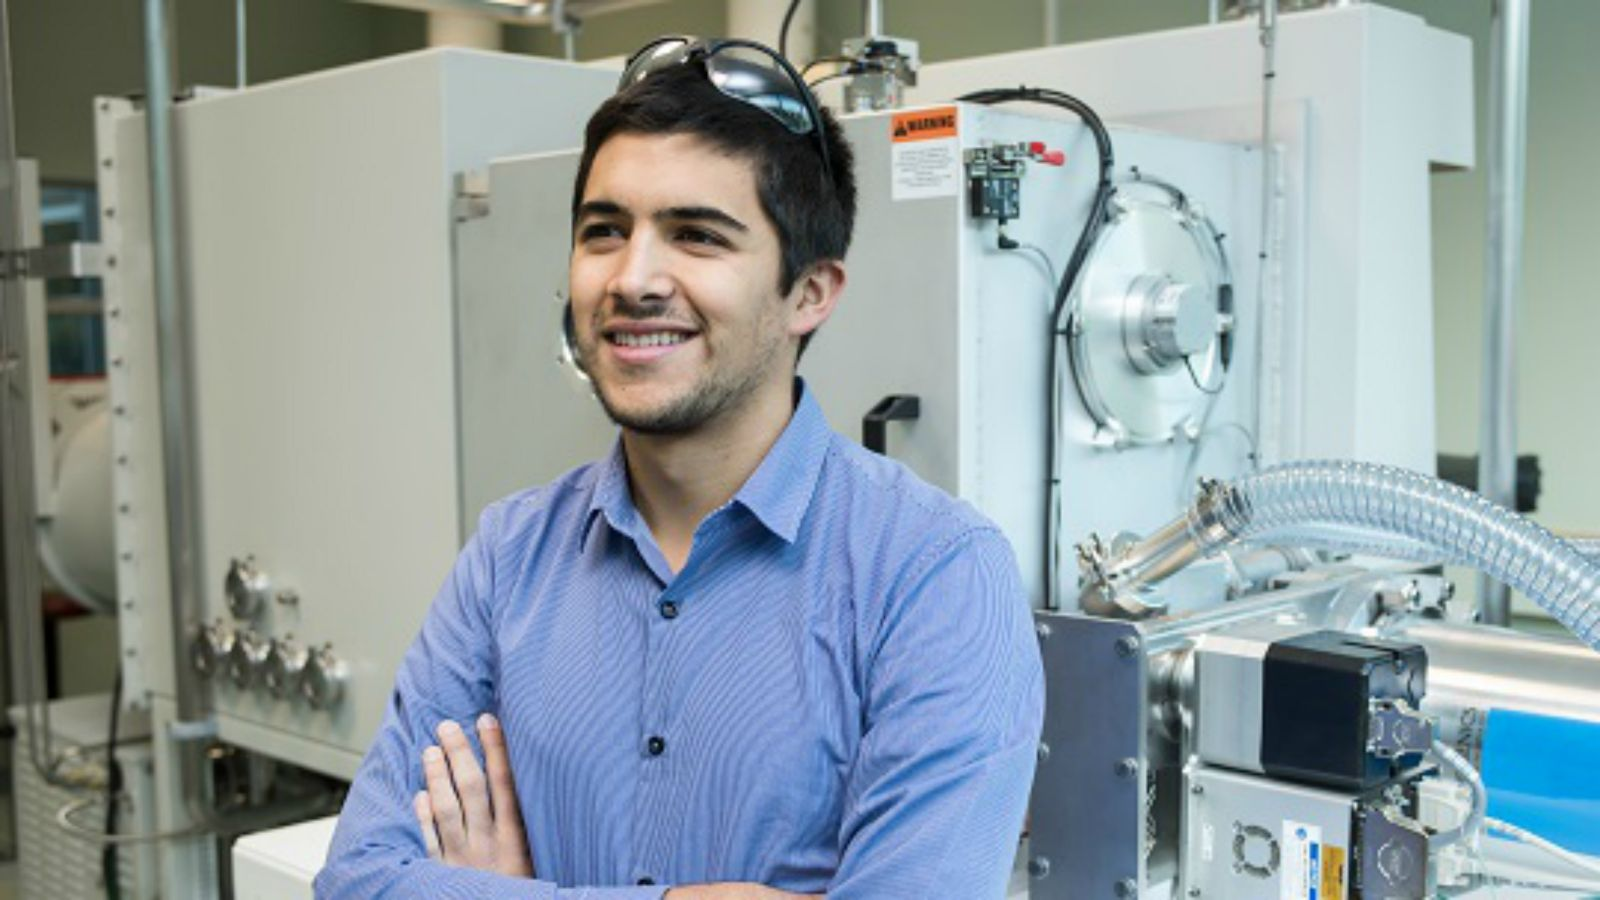 Aleksa Djorovic stands in lab